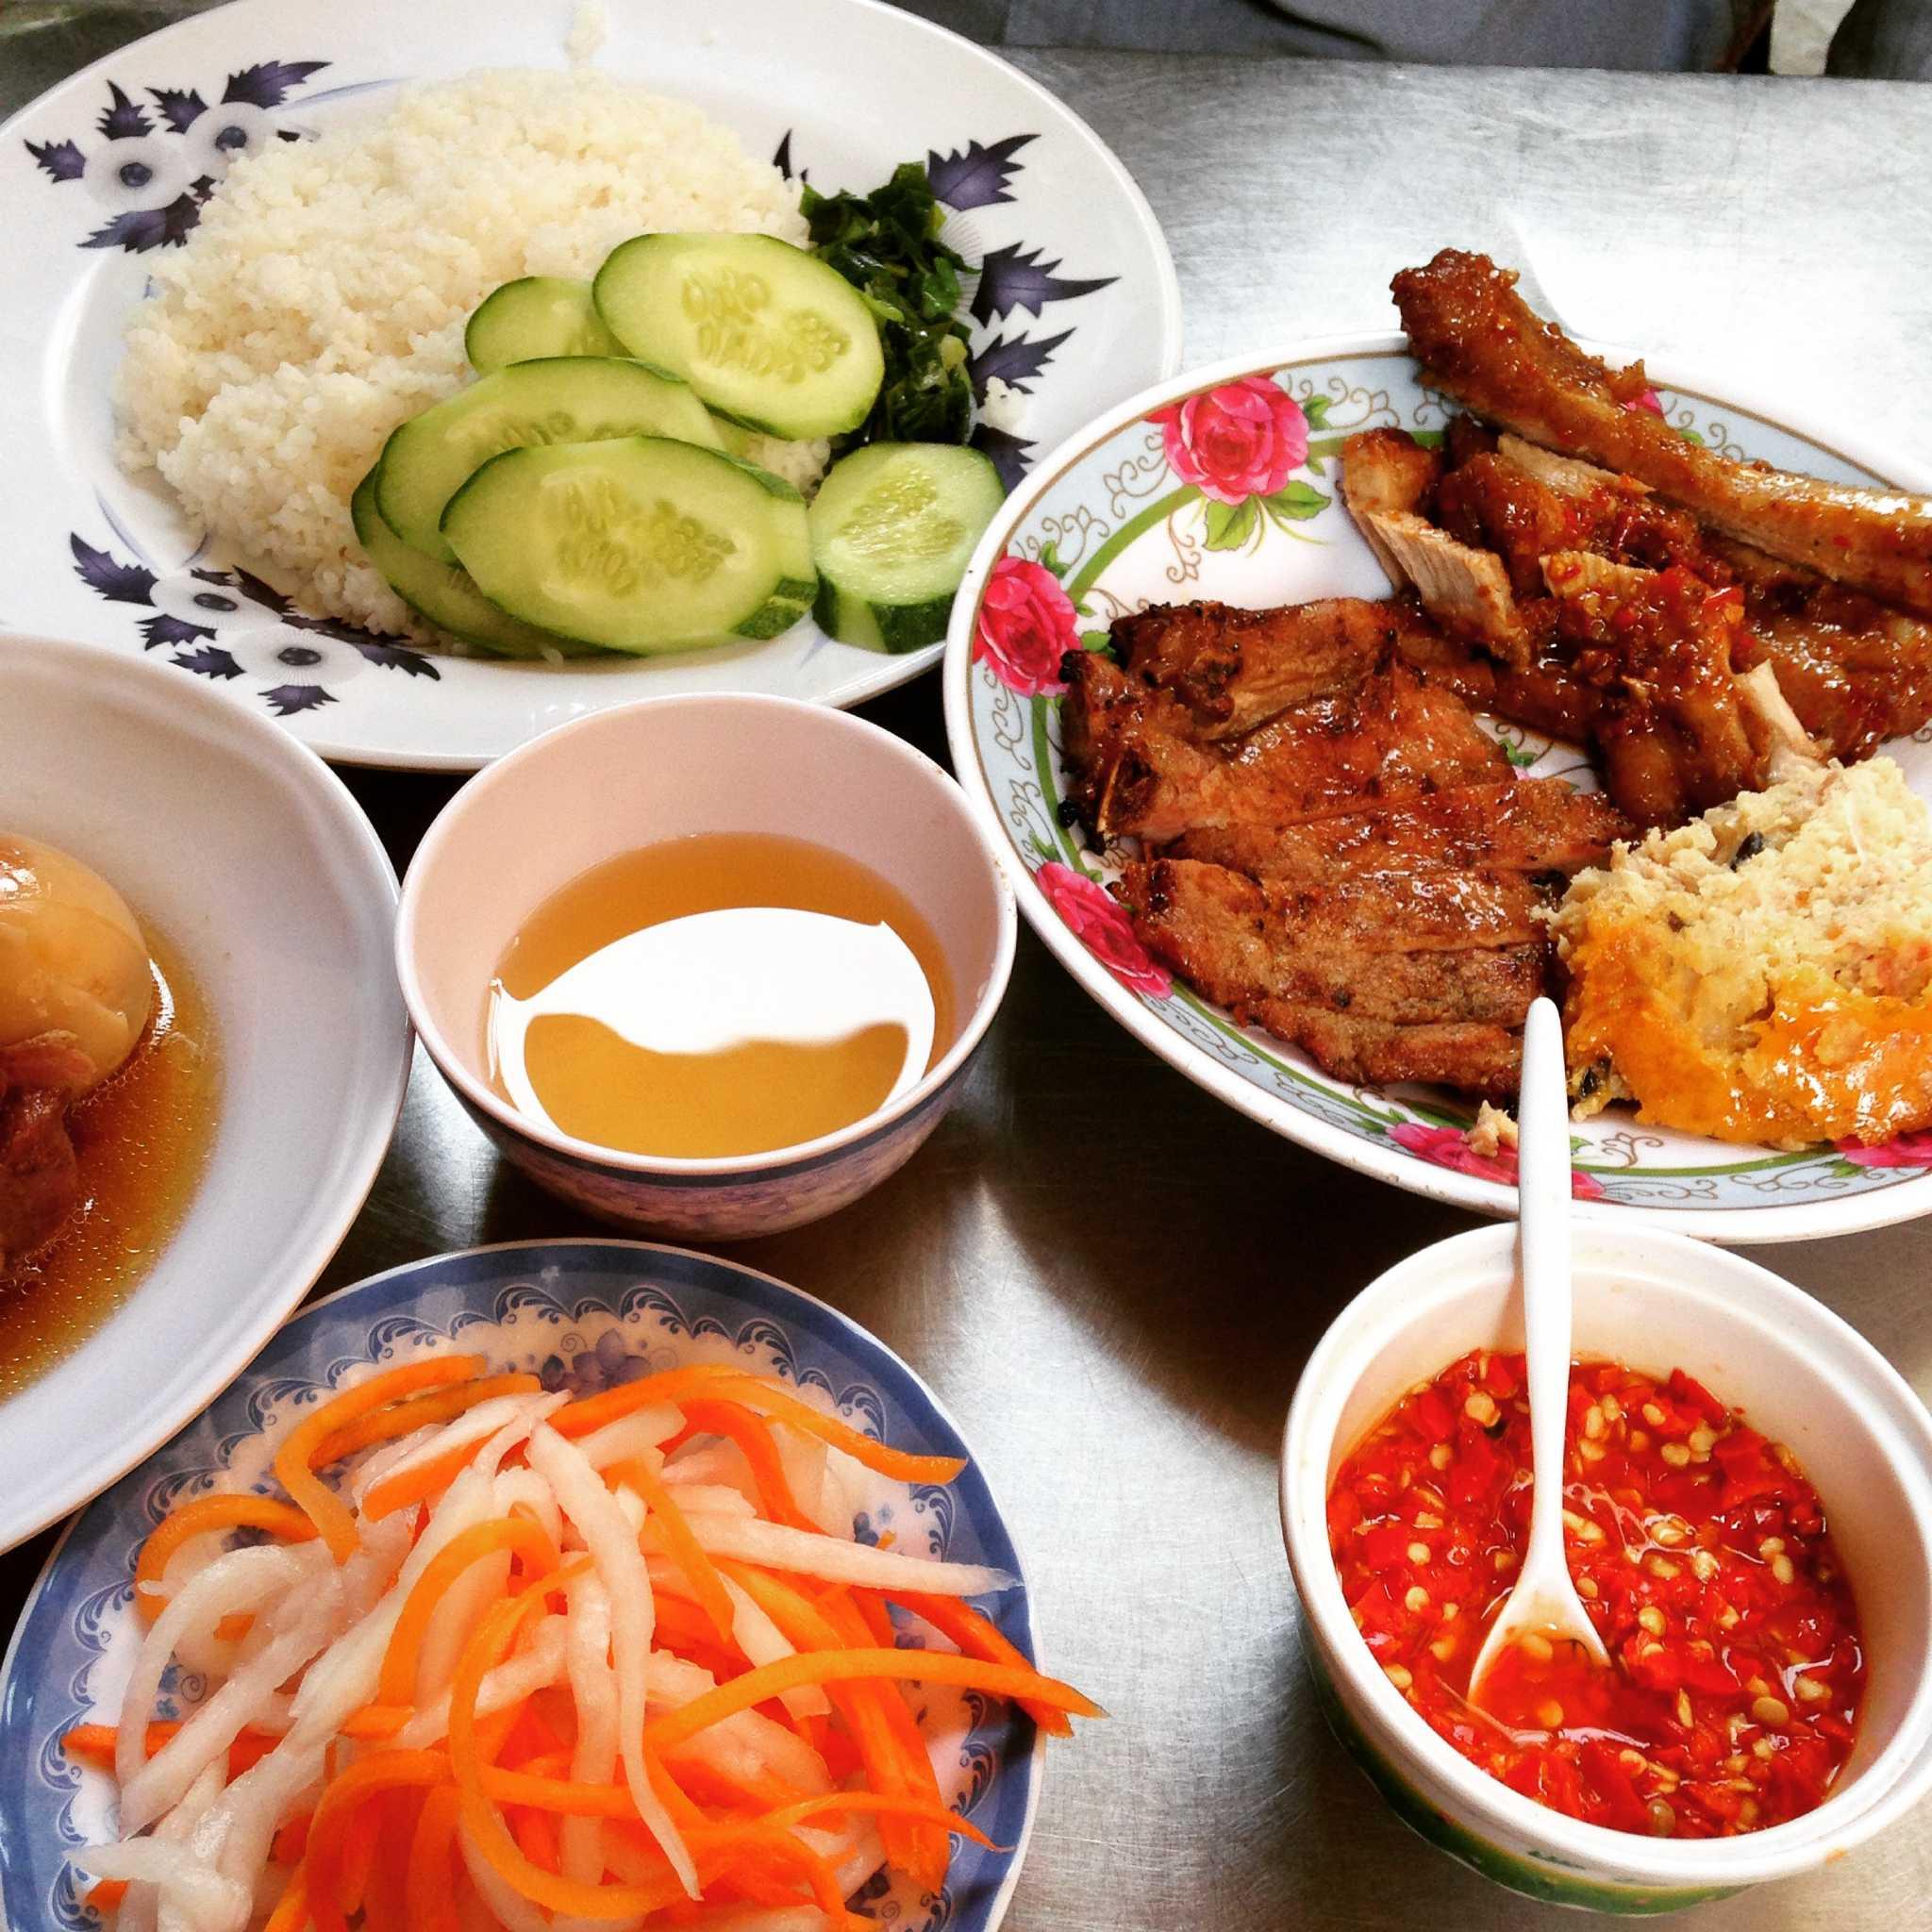 Chris Shepherd's foodie tour of Vietnam